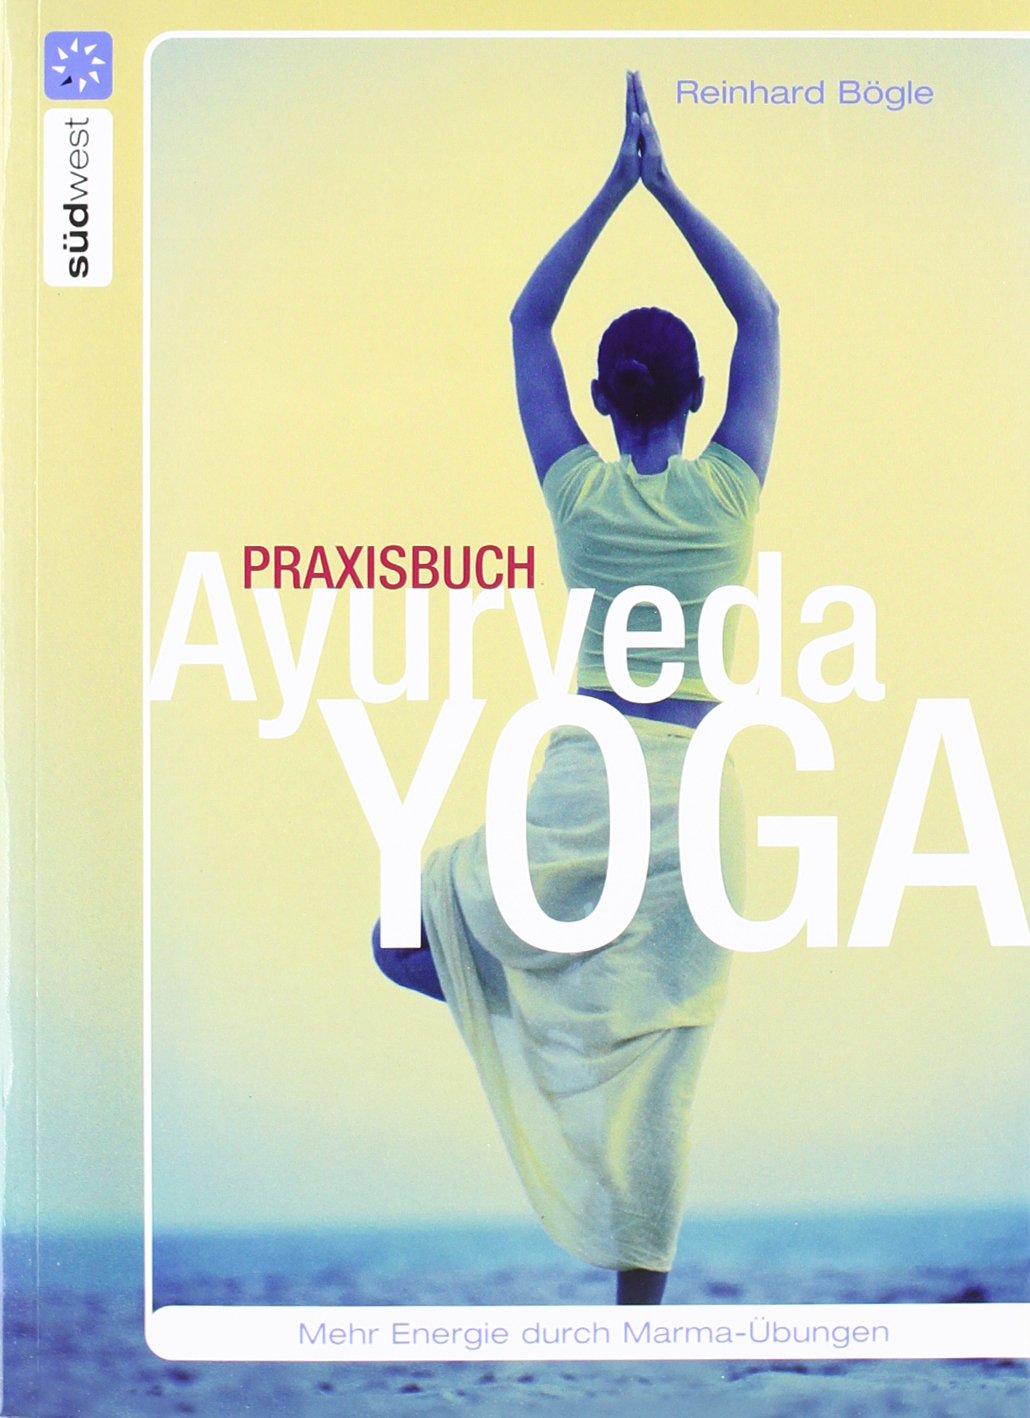 Praxisbuch Ayurveda-Yoga: 9783517082721: Amazon.com: Books